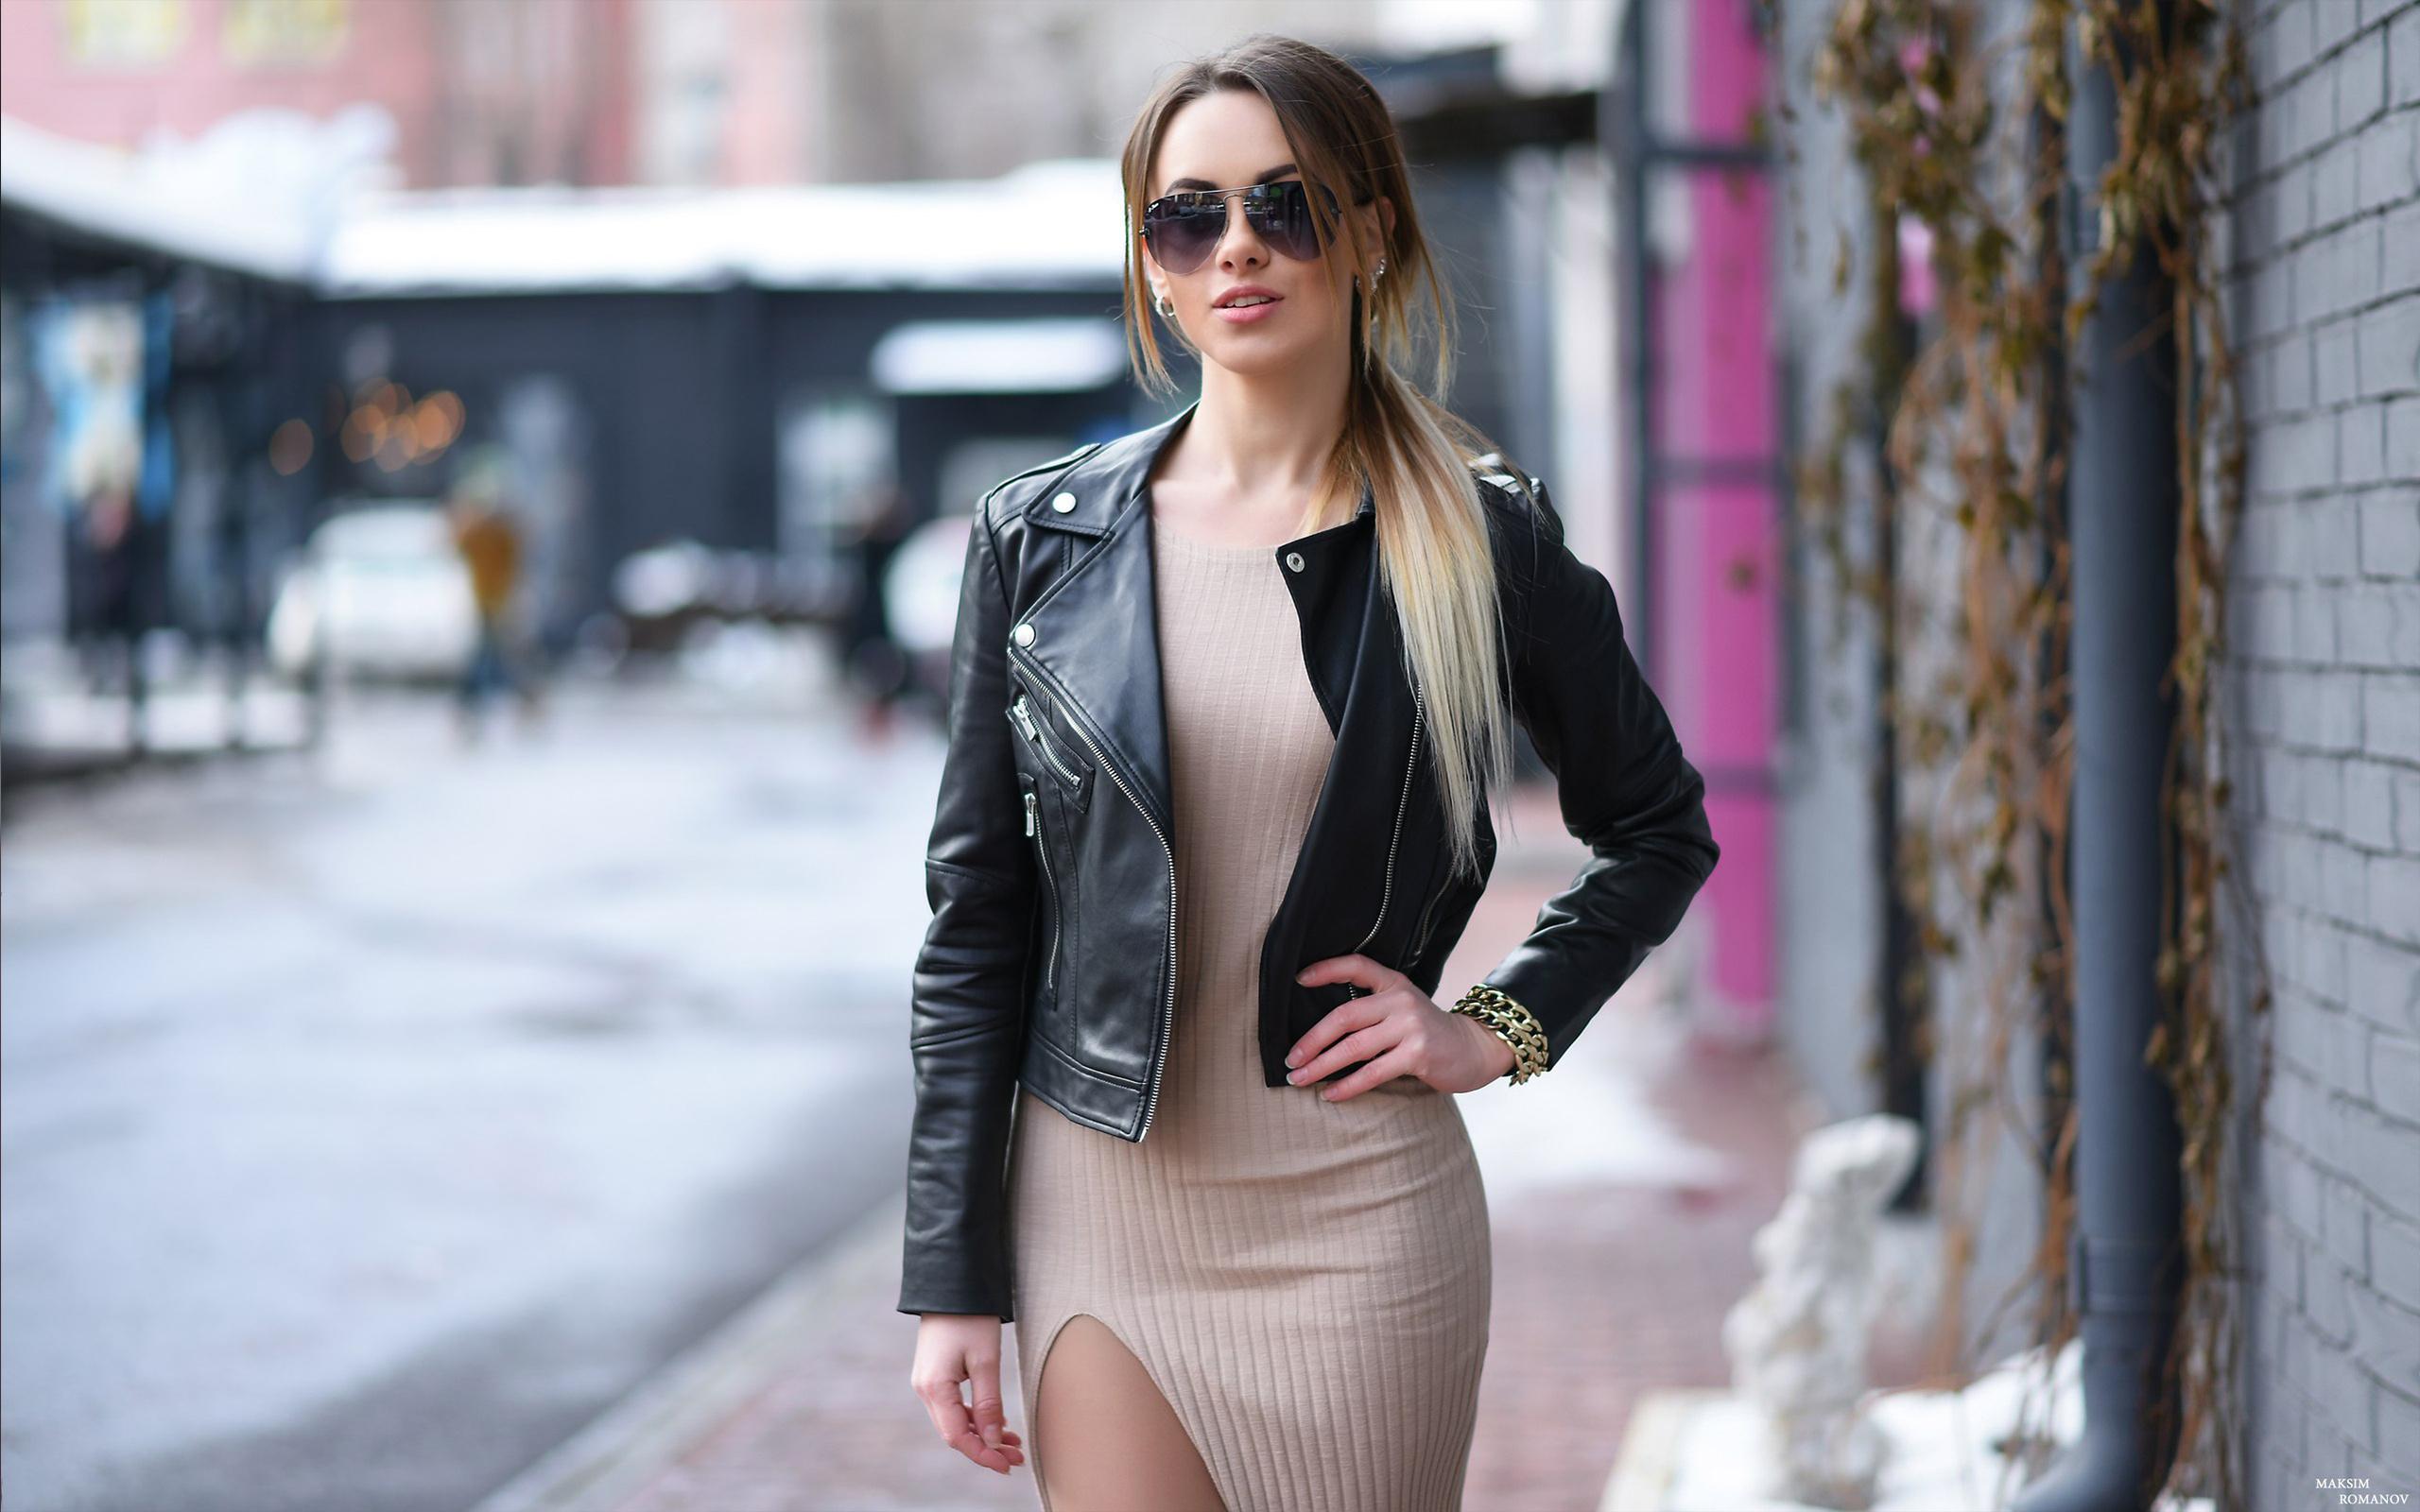 Картинка: Девушка, стиль, улица, куртка, очки, блондинка